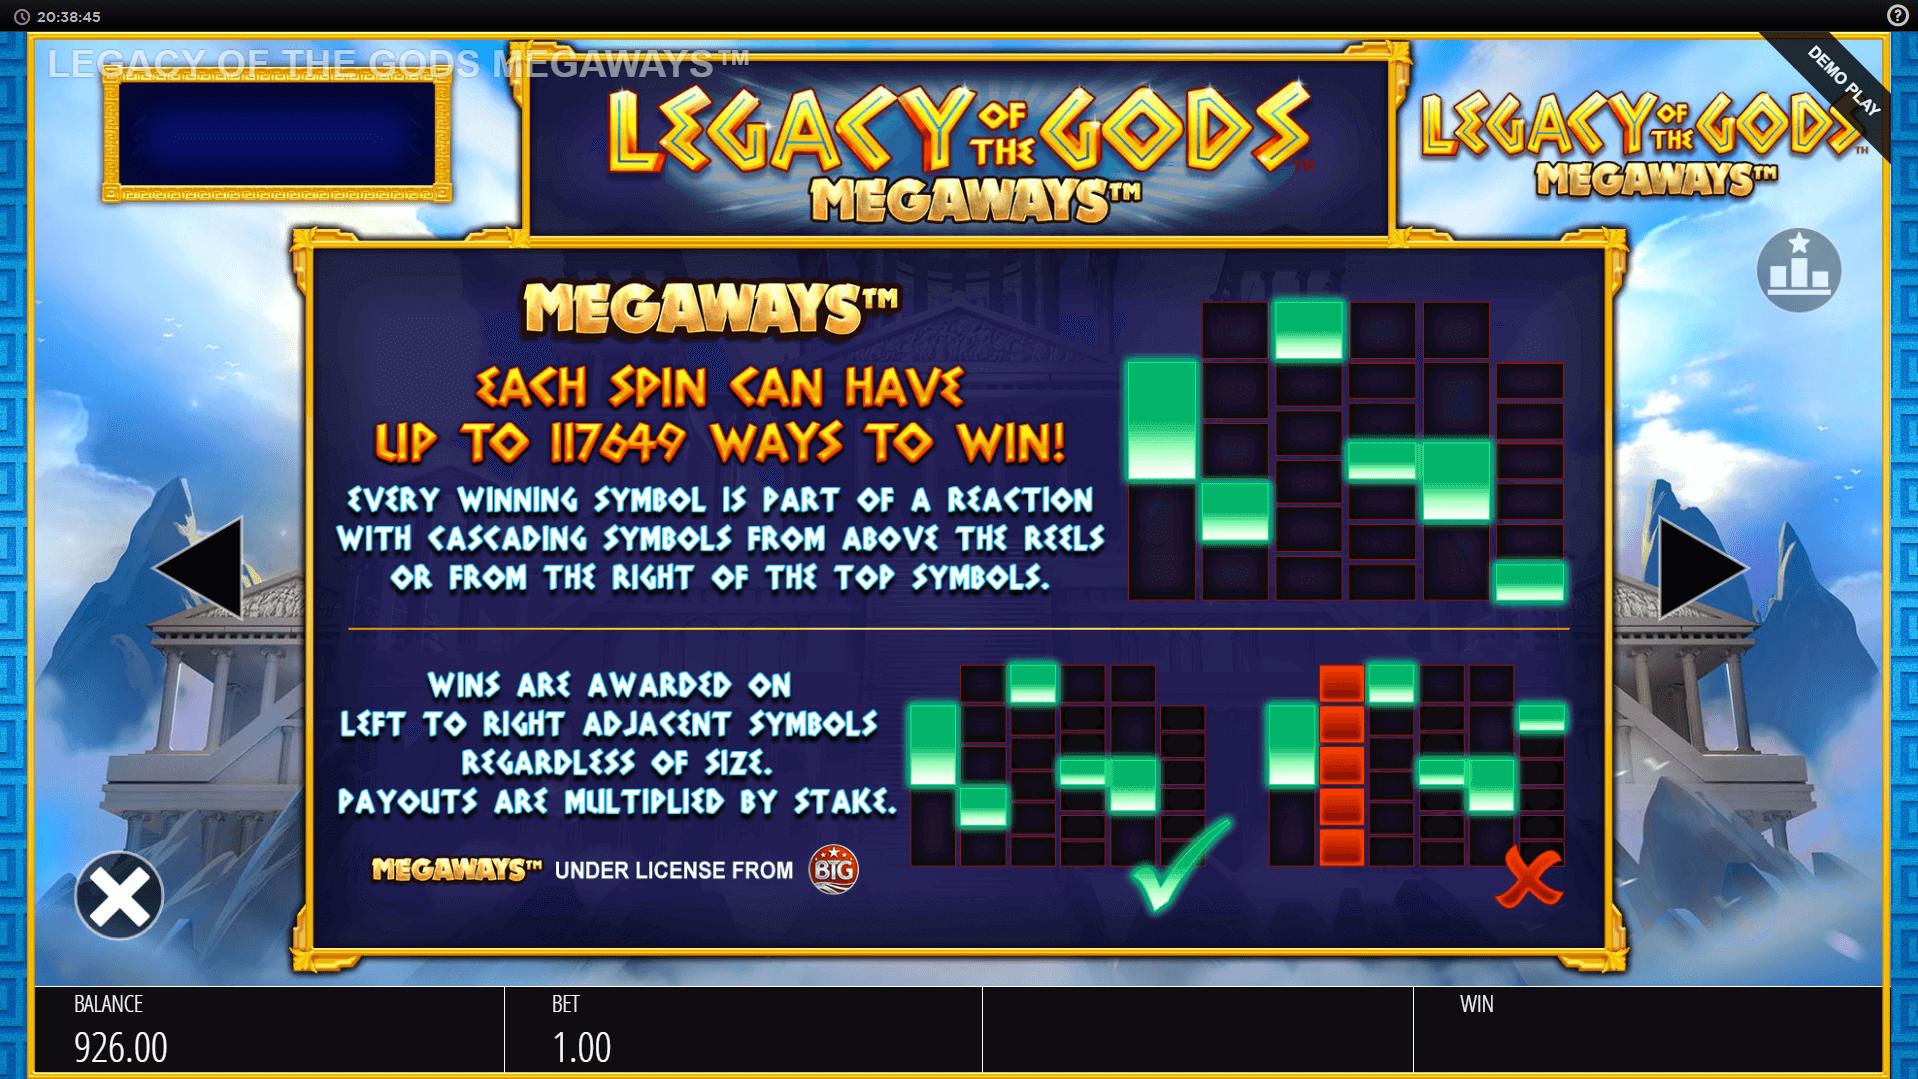 Legacy of the Gods Megaways Slot Info